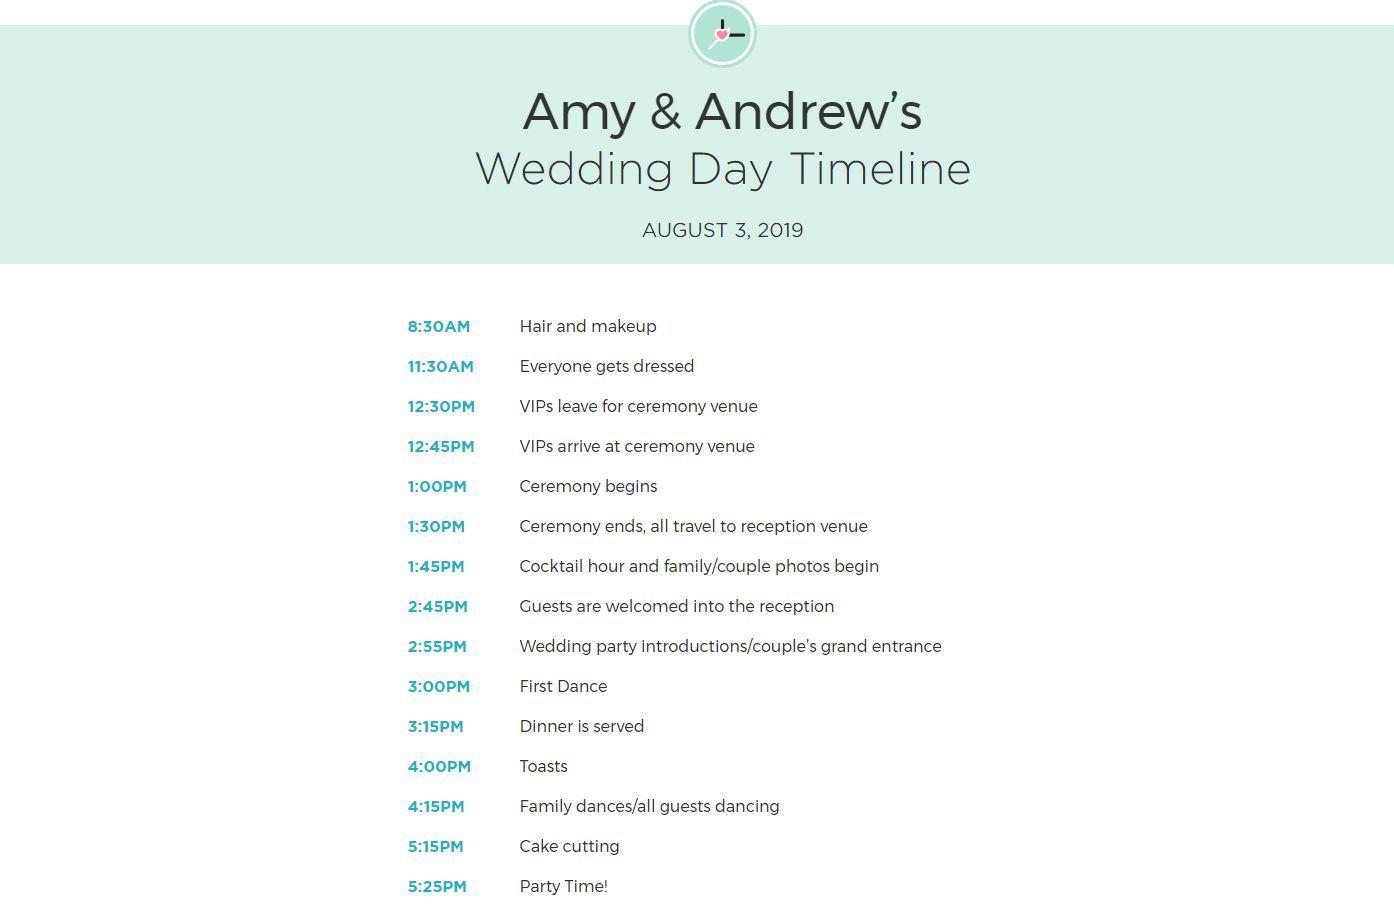 010 Unforgettable Wedding Timeline Template Free Download Sample Full